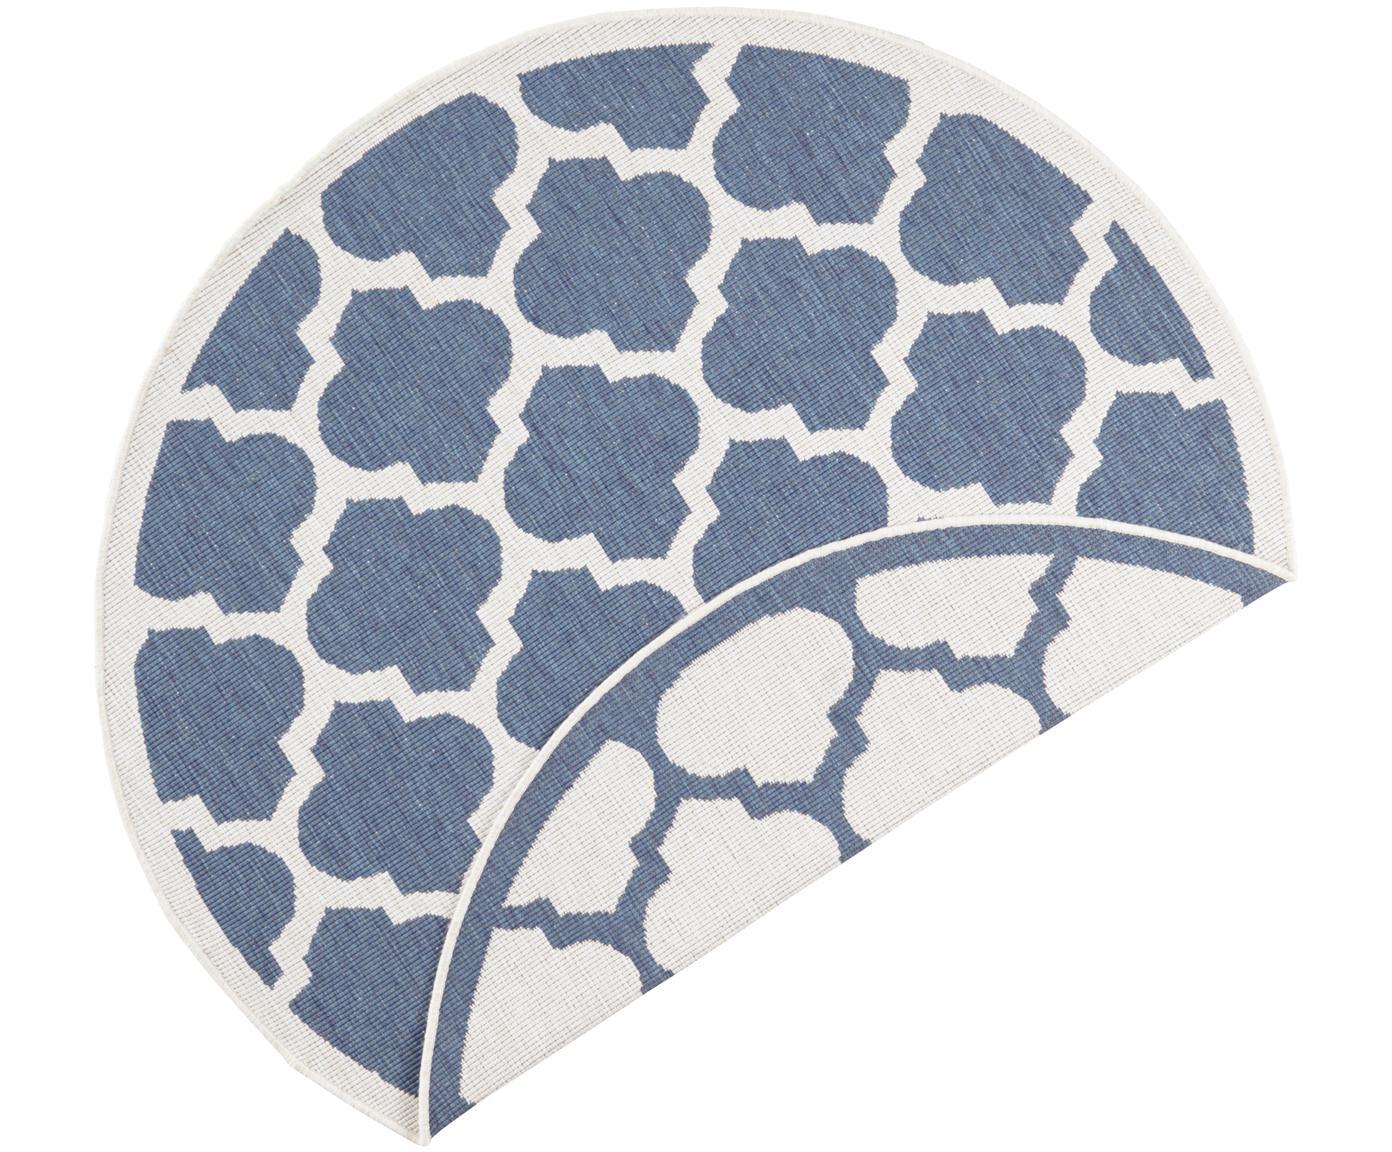 Alfombra redonda reversible de interior/exterior Palermo, Azul, crema, Ø 140 cm (Tamaño M)